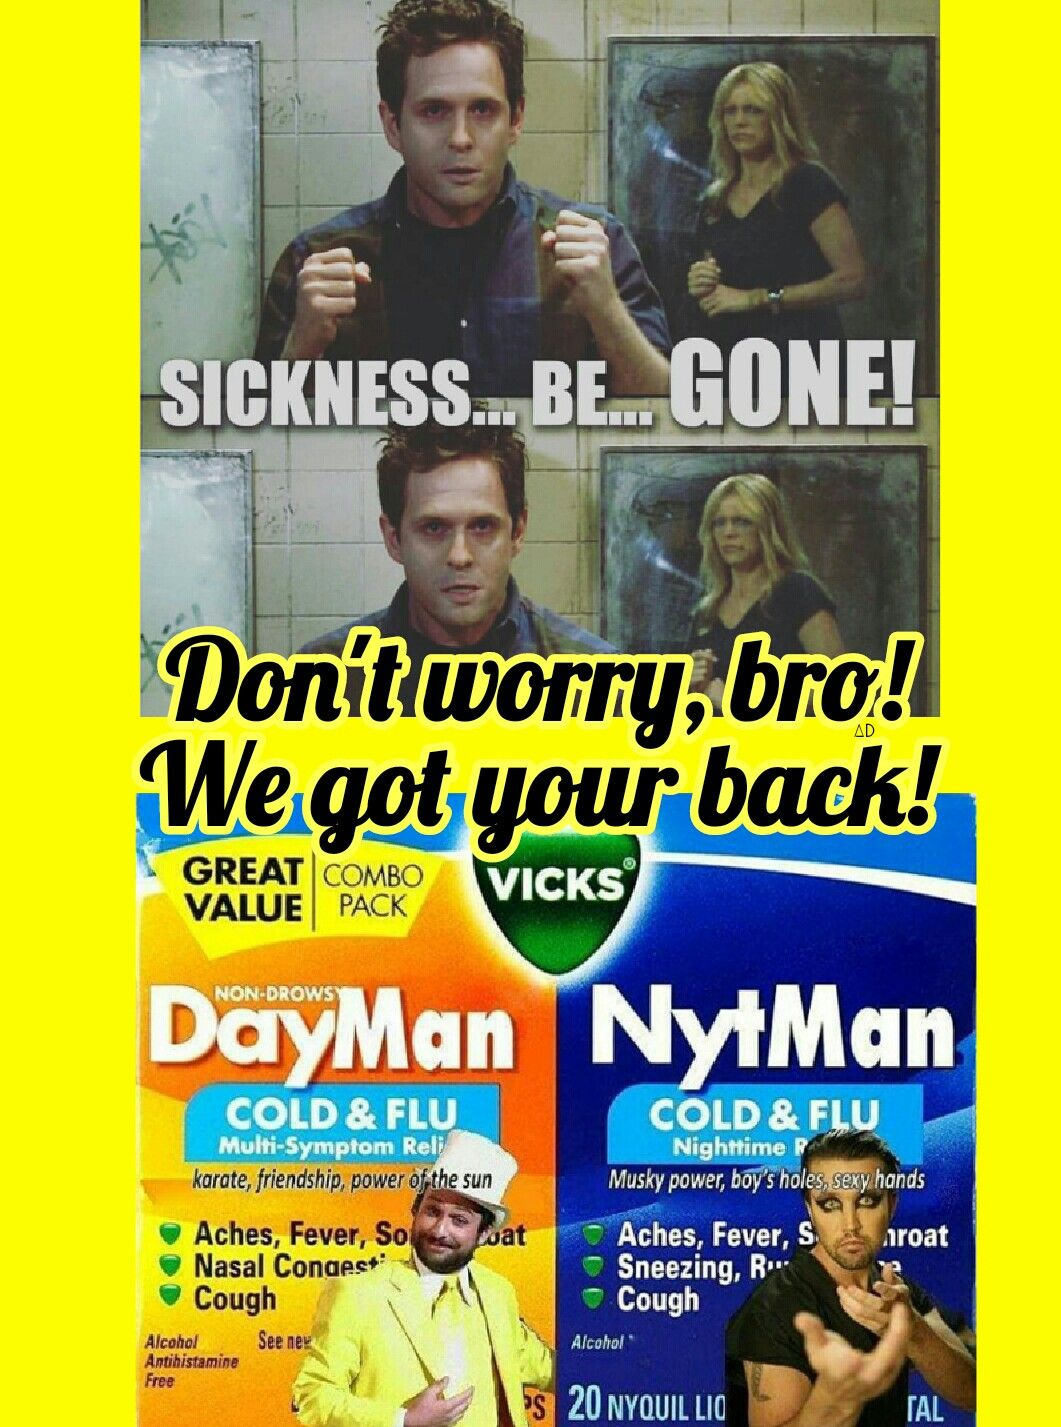 sickness be gone dennis reynolds vick s dayman nytman cold